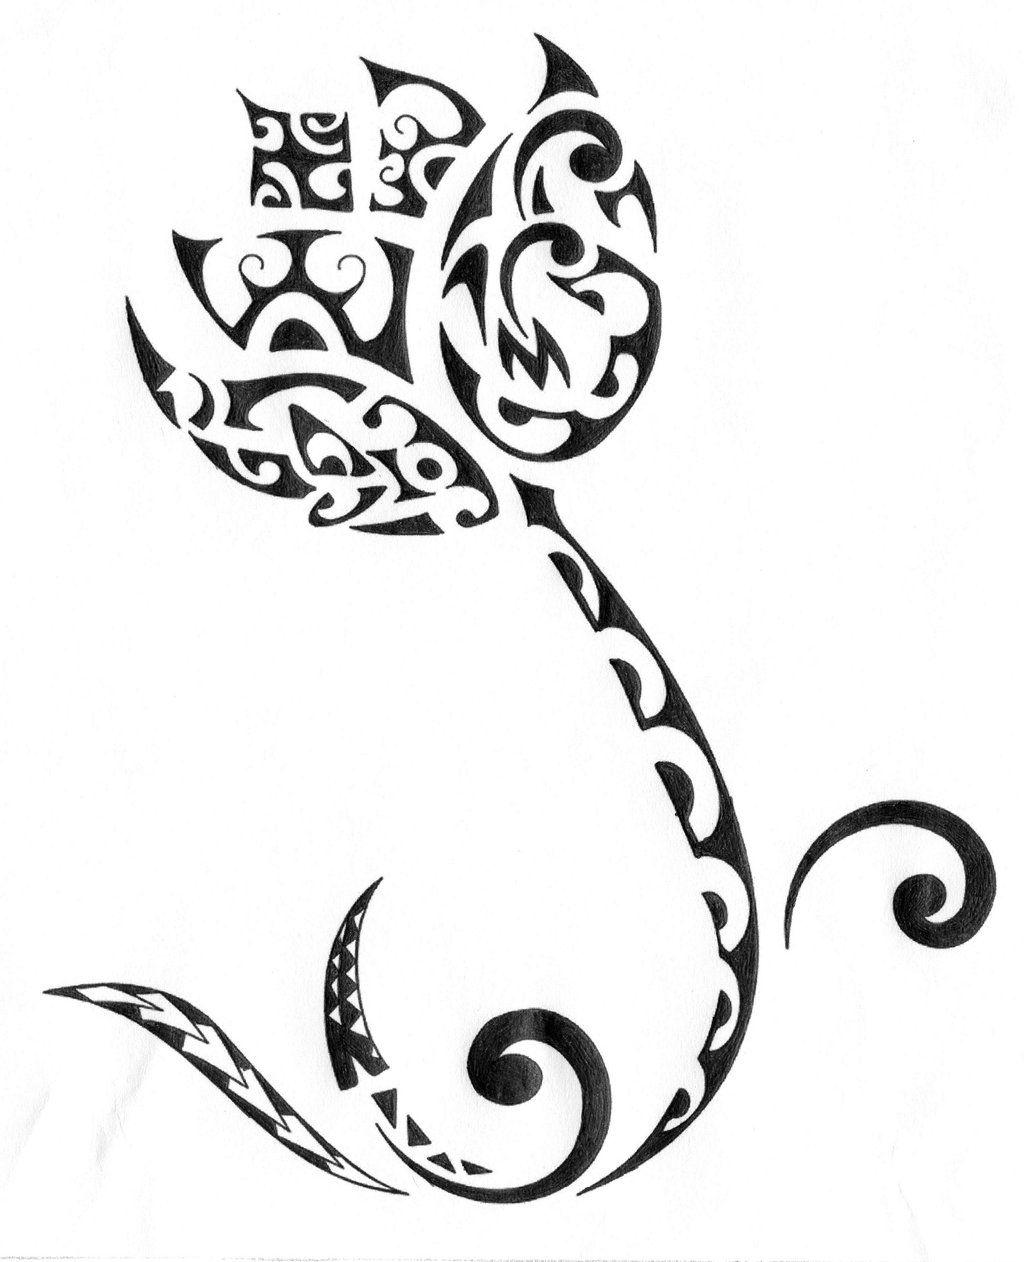 Polynesian Lotus Tattoo By Heavymetalsun On Deviantart